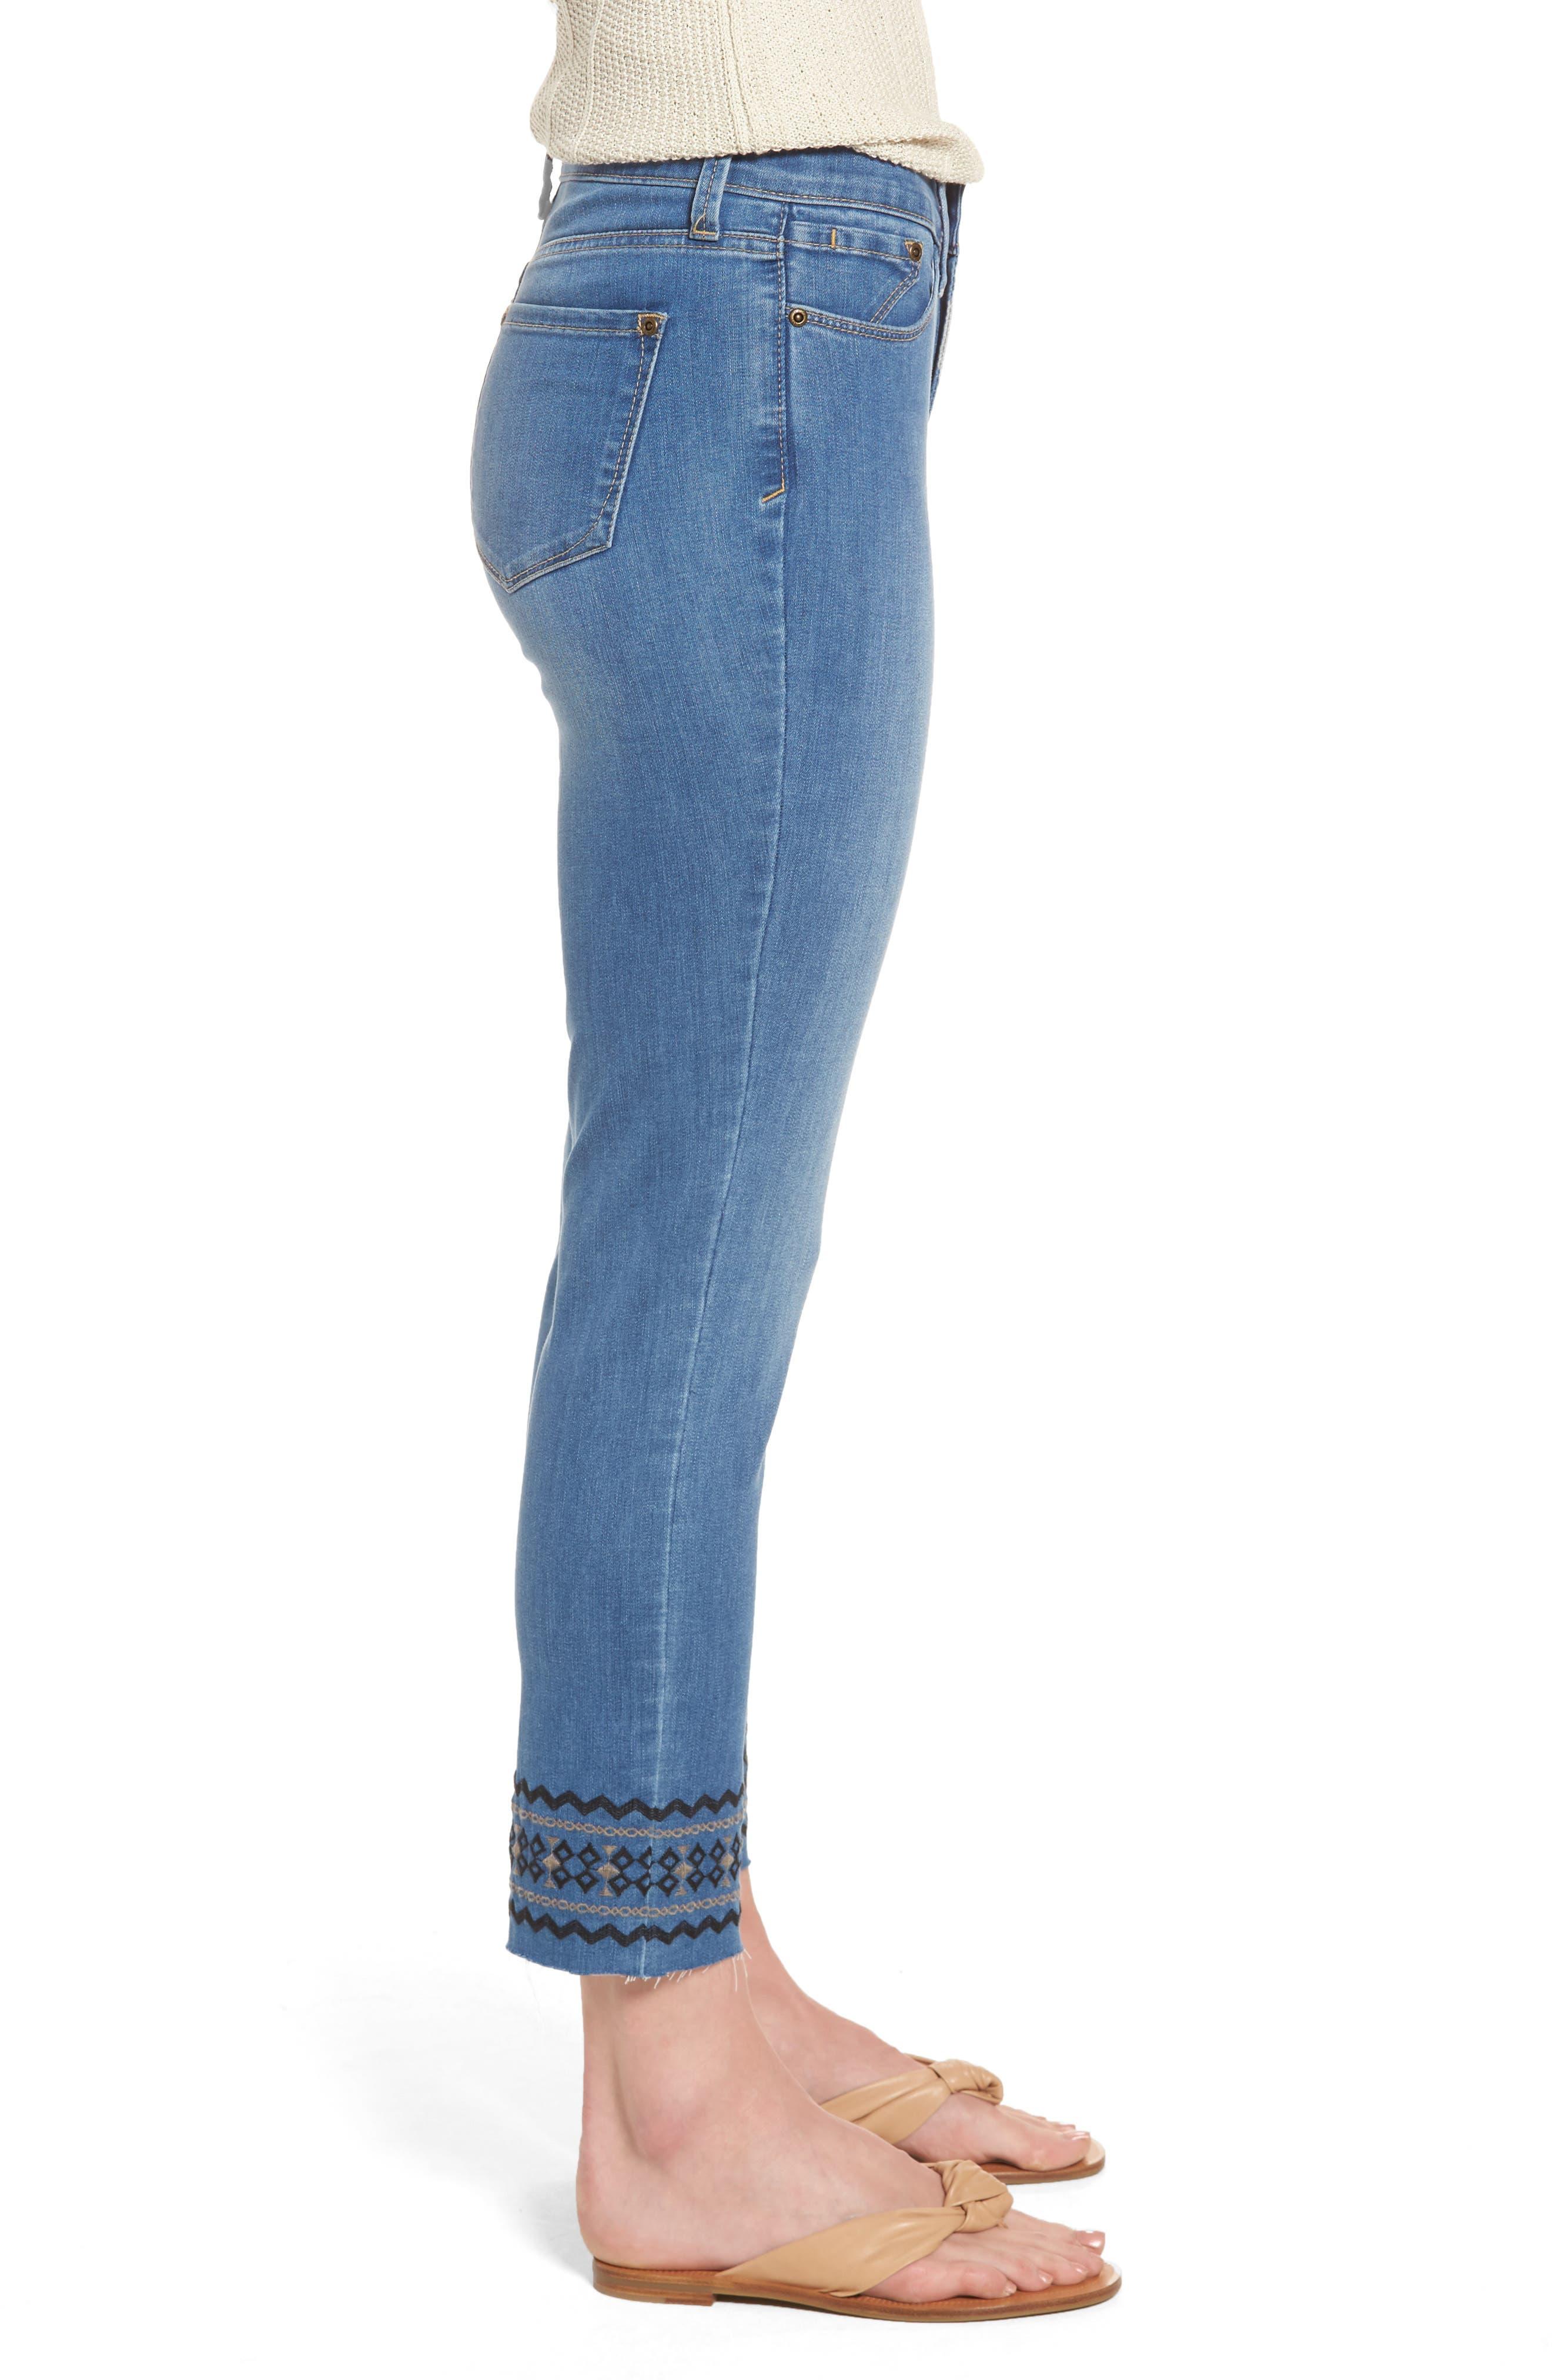 Alternate Image 3  - NYDJ Sheri Embroidered Stretch Slim Crop Jeans (Evansdale)